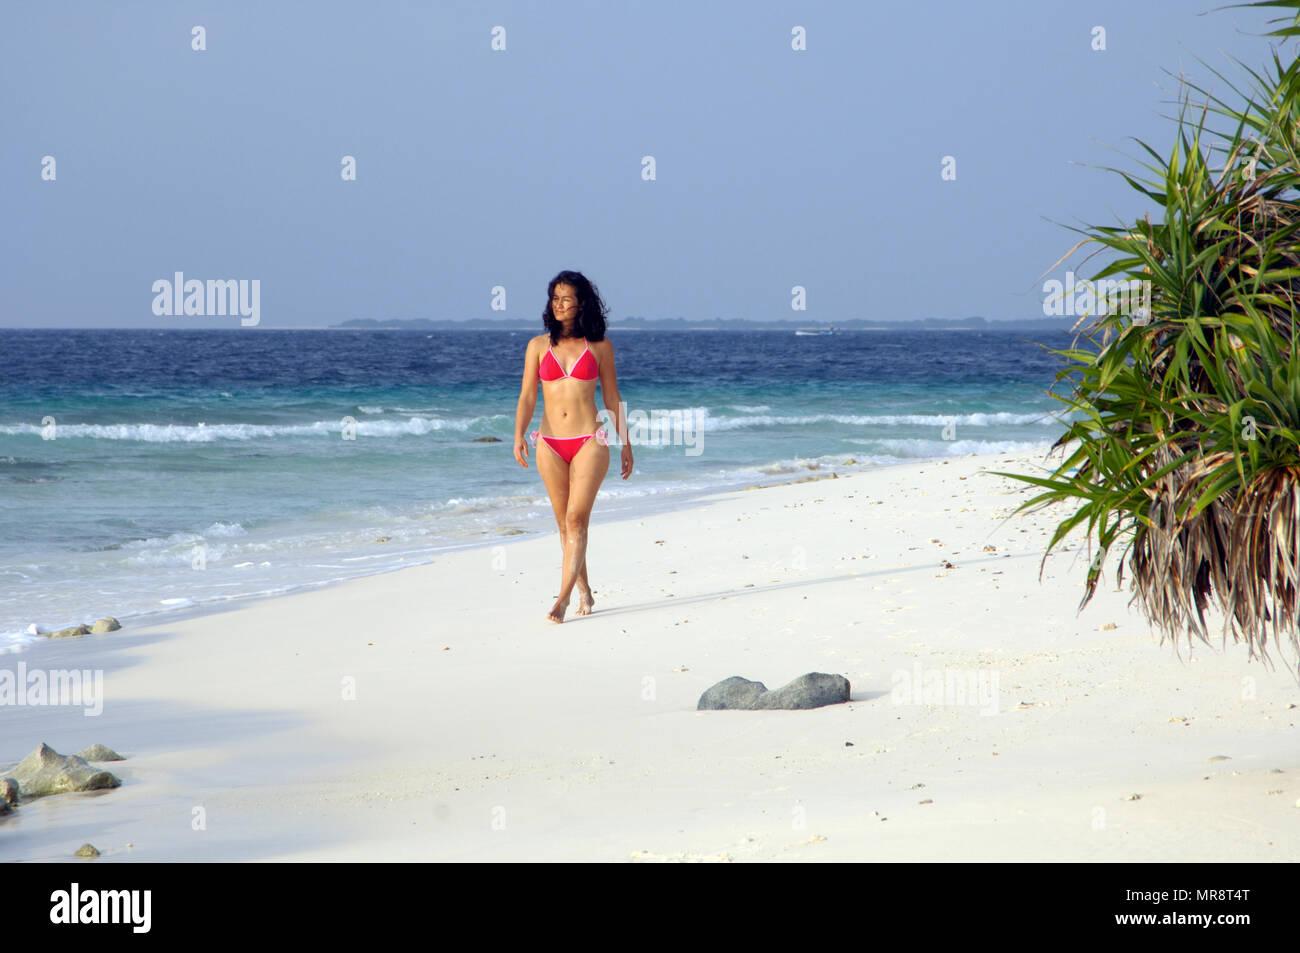 Maldives, beach walk | Malediven, Strandspaziergang - Stock Image